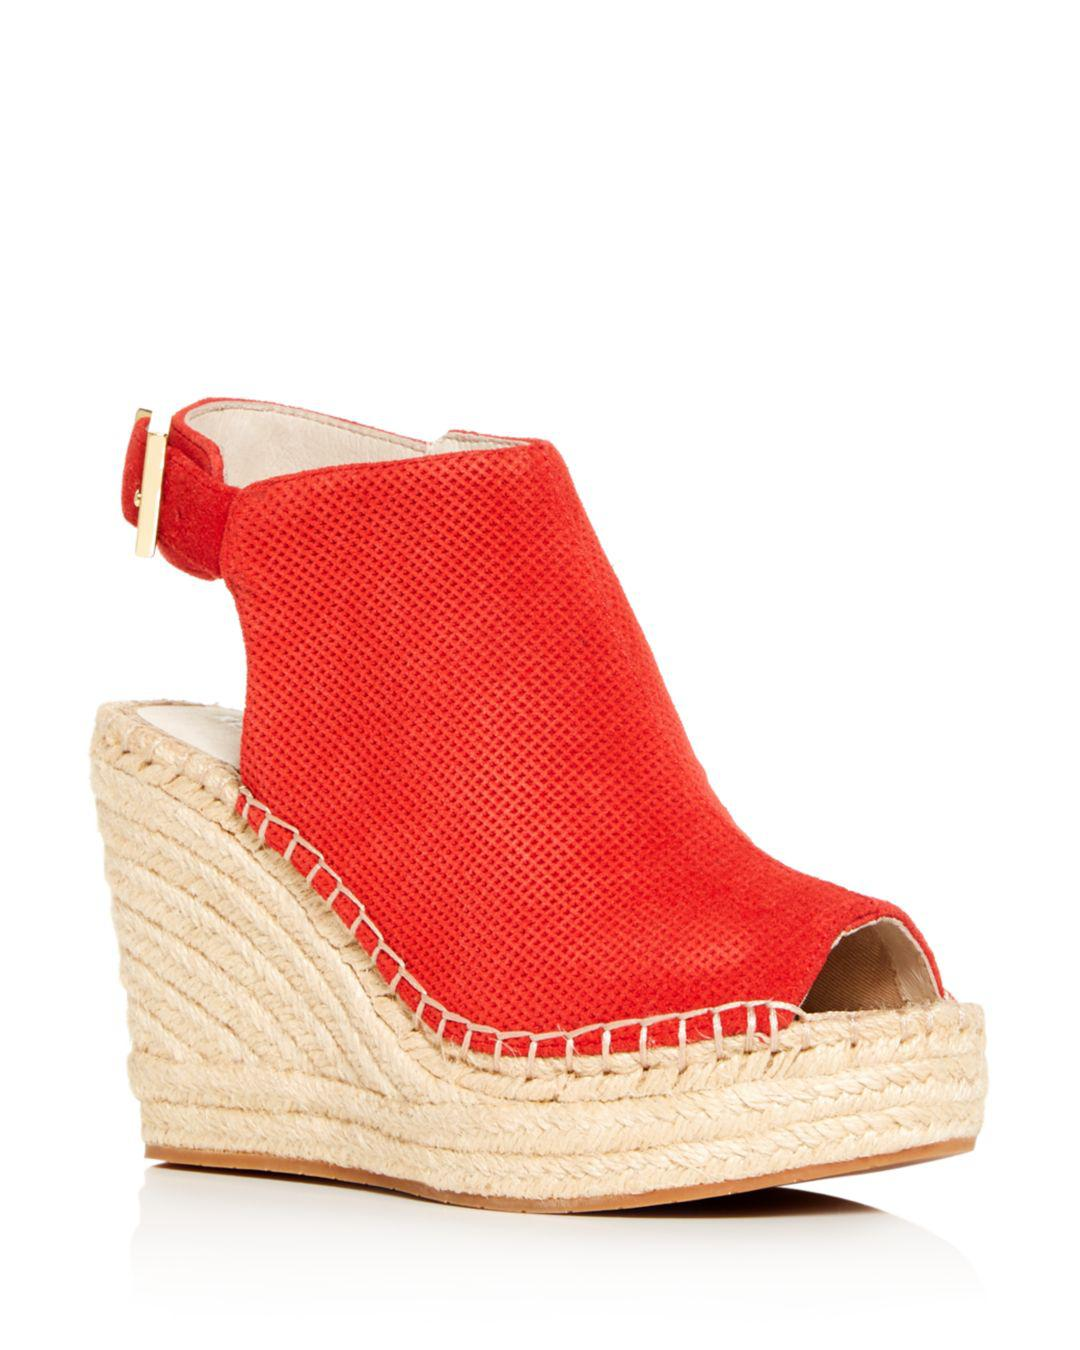 761cdbb5ef3 Kenneth Cole. Women s Olivia Perforated Platform Wedge Espadrille Sandals